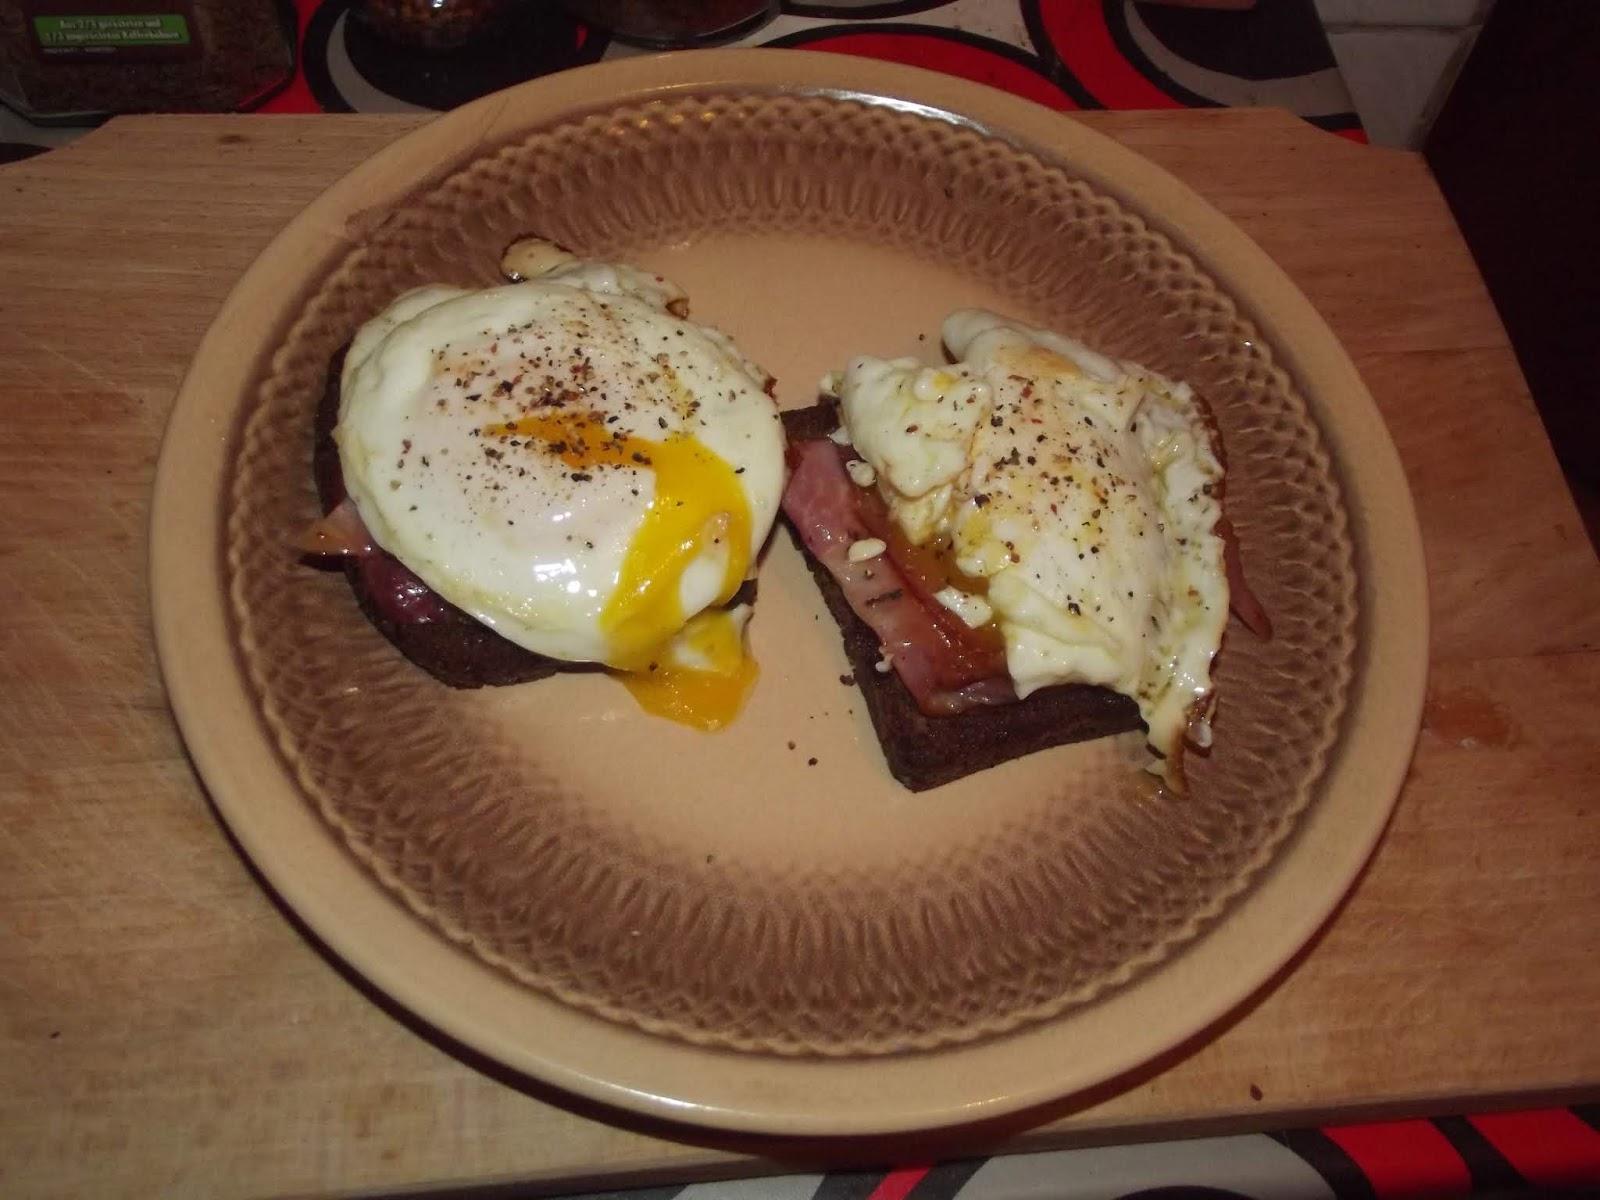 Adventures in Flavorland: Strammer Max (German ham and eggs